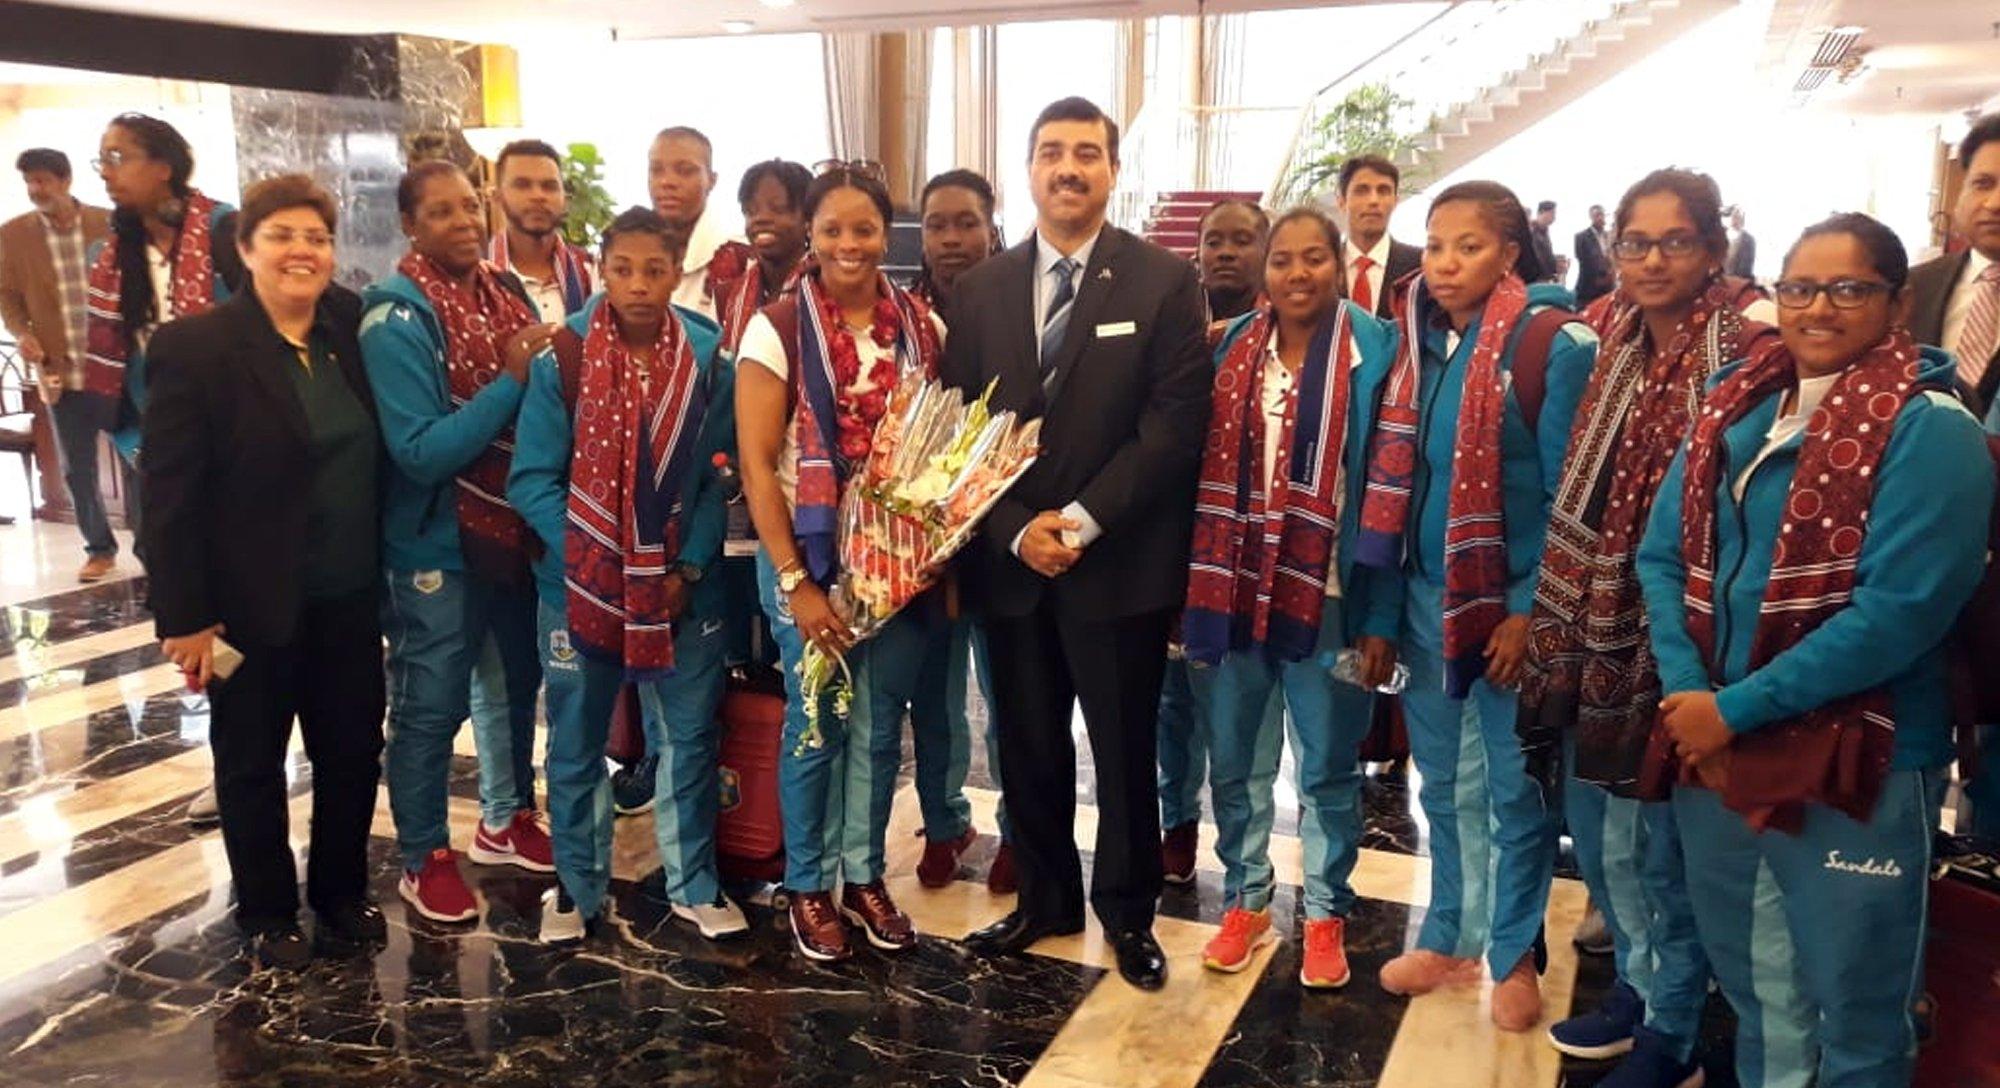 west indies women s team arrive in karachi for t20i series